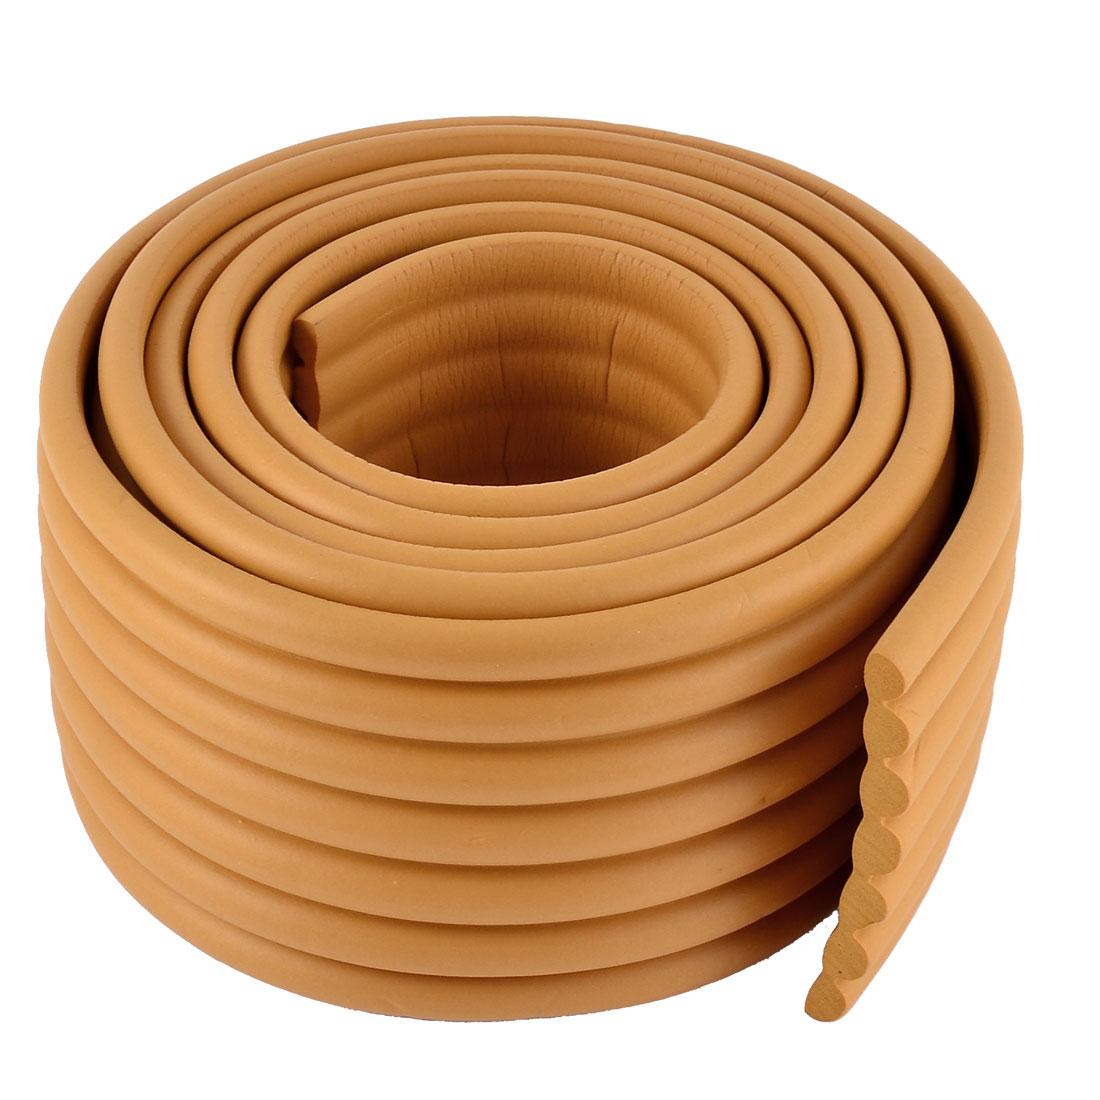 Furniture Corner Edge Protection Cushion Guard Wood Color w Adhesive Tape